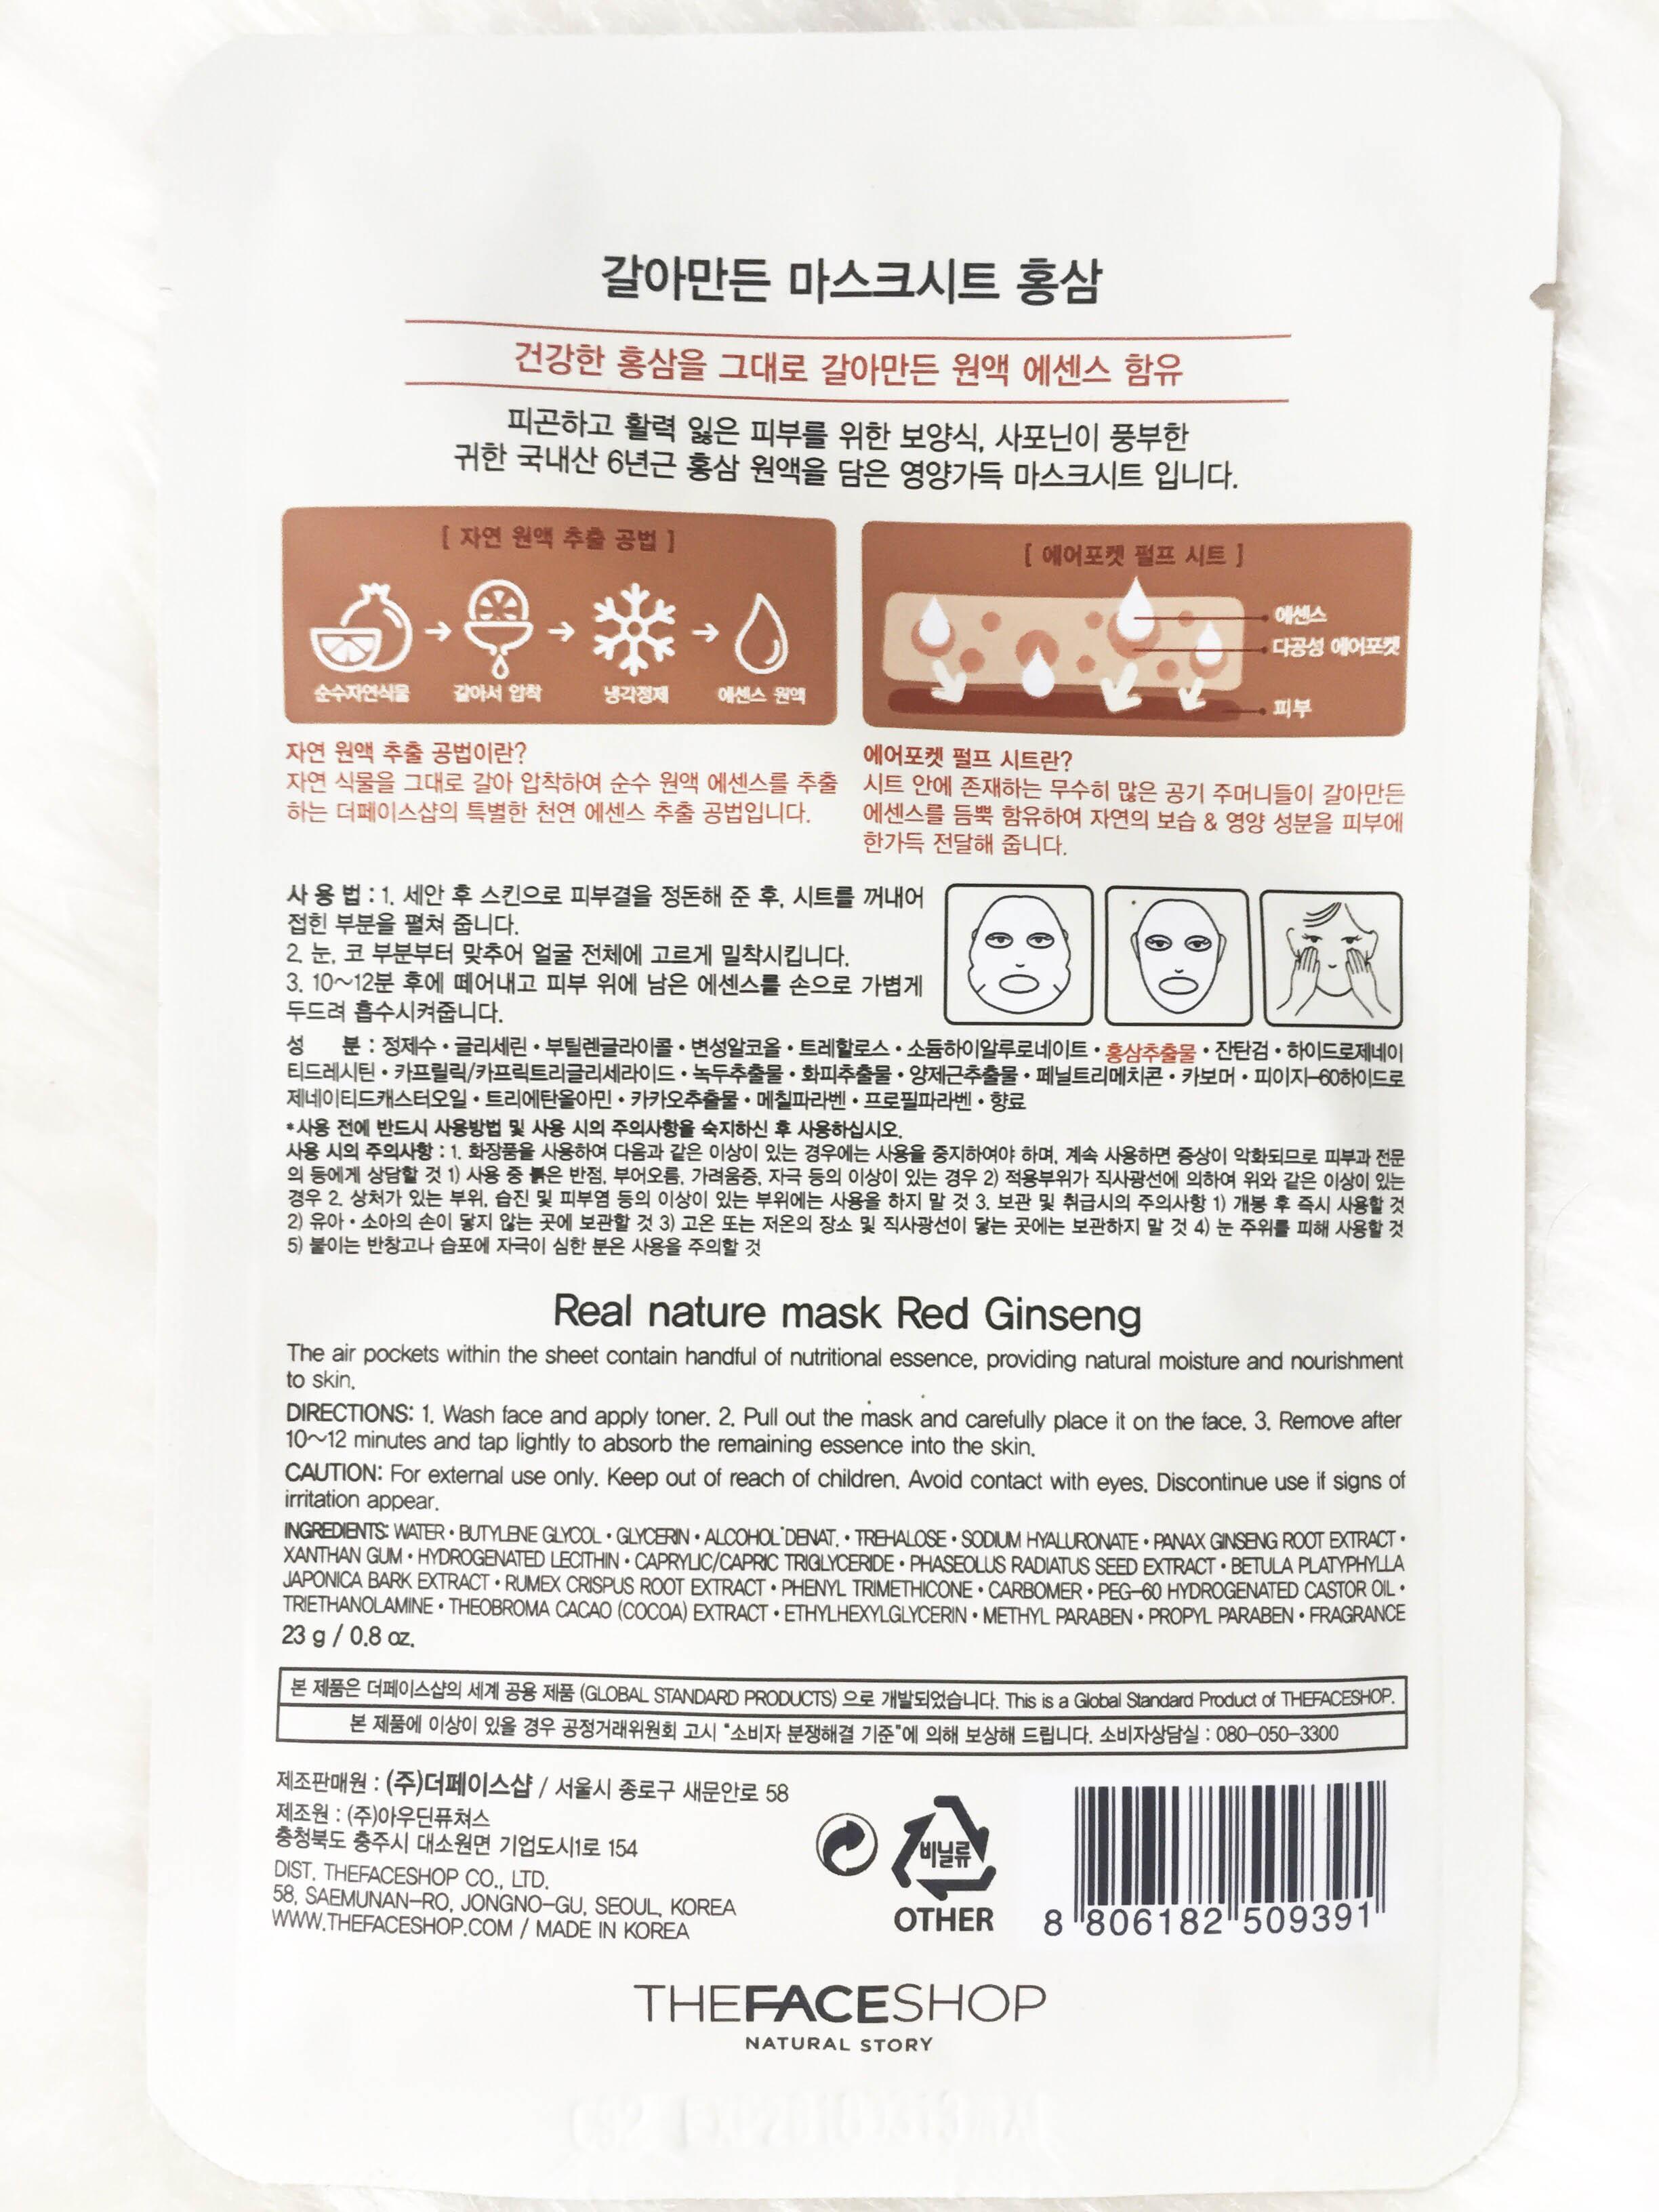 Face Shop Red Ginseng Sheet Mask